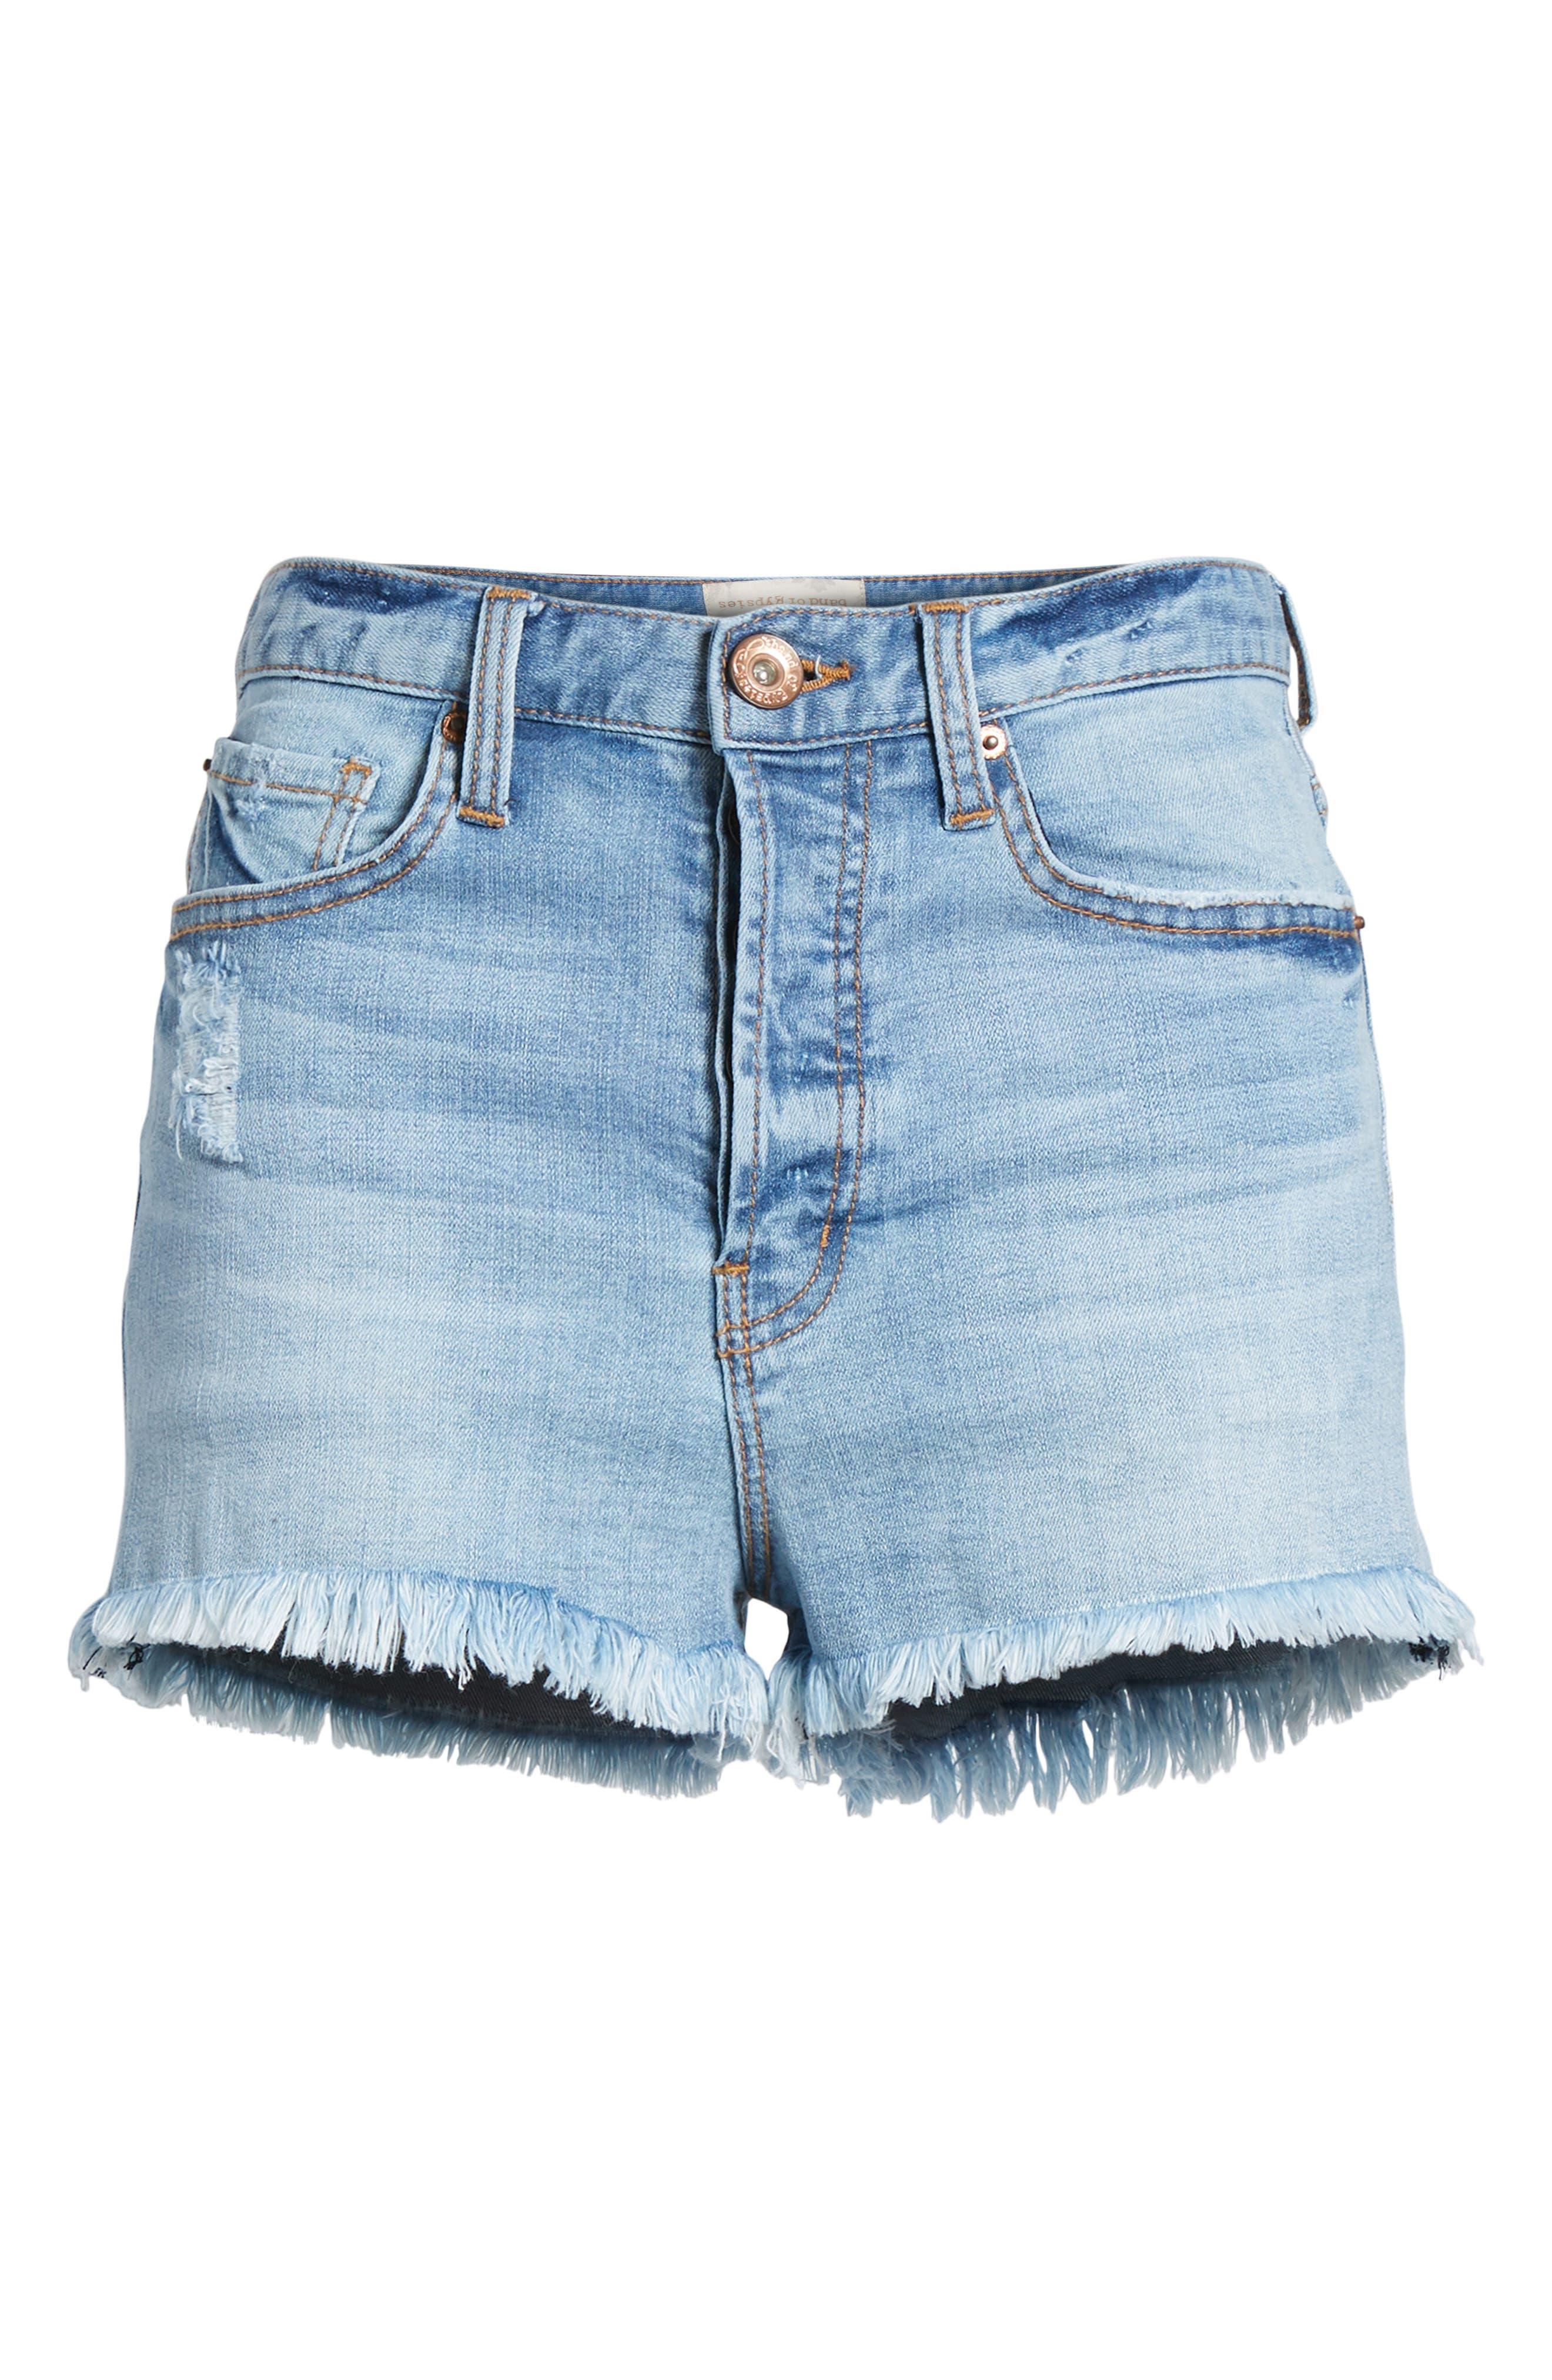 Zoey Denim Shorts,                             Alternate thumbnail 7, color,                             Dustbowl